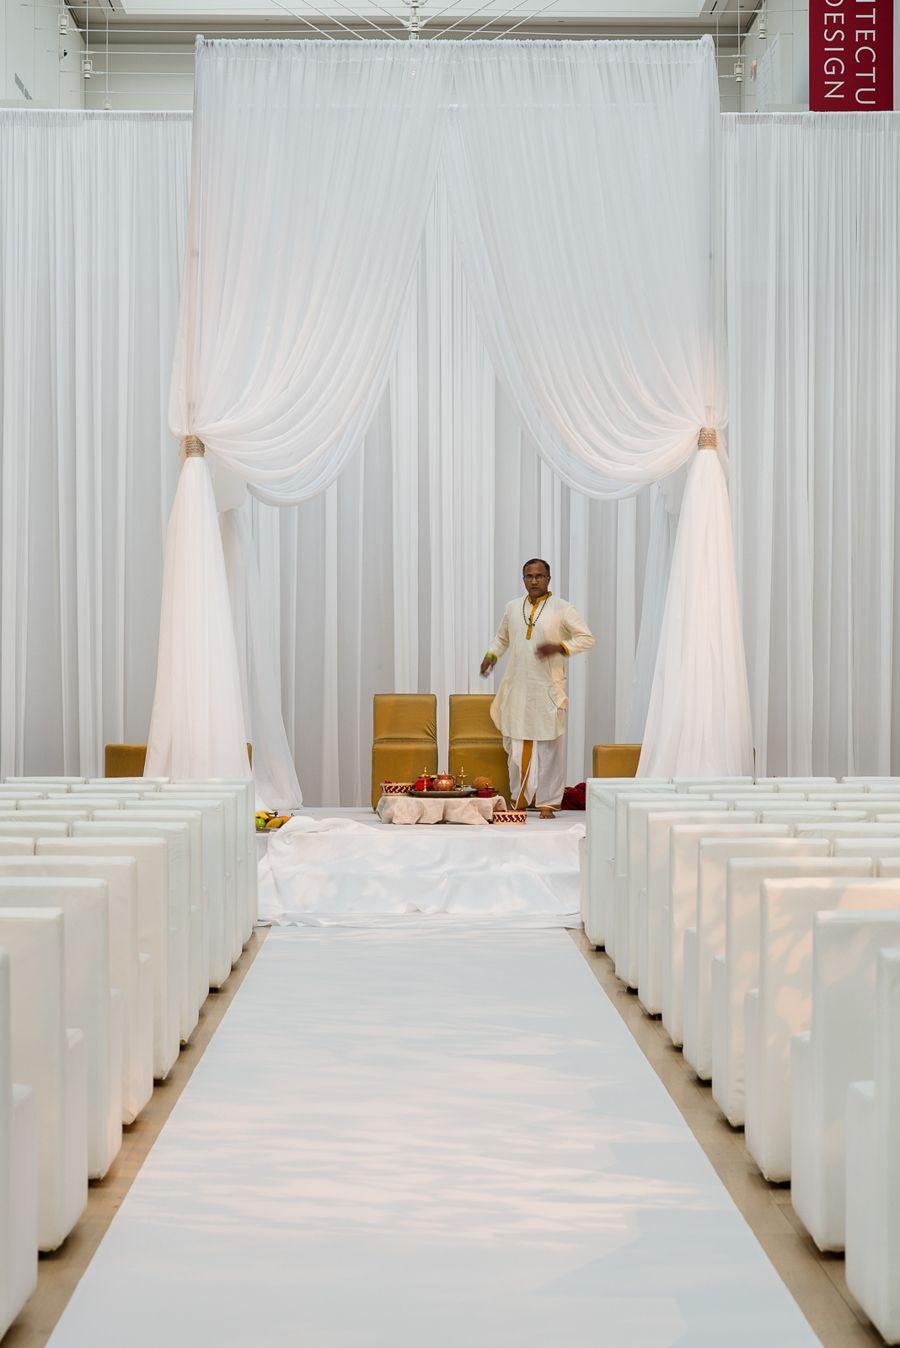 Beautiful Wedding Decor Chicago Images - The Wedding Ideas ...